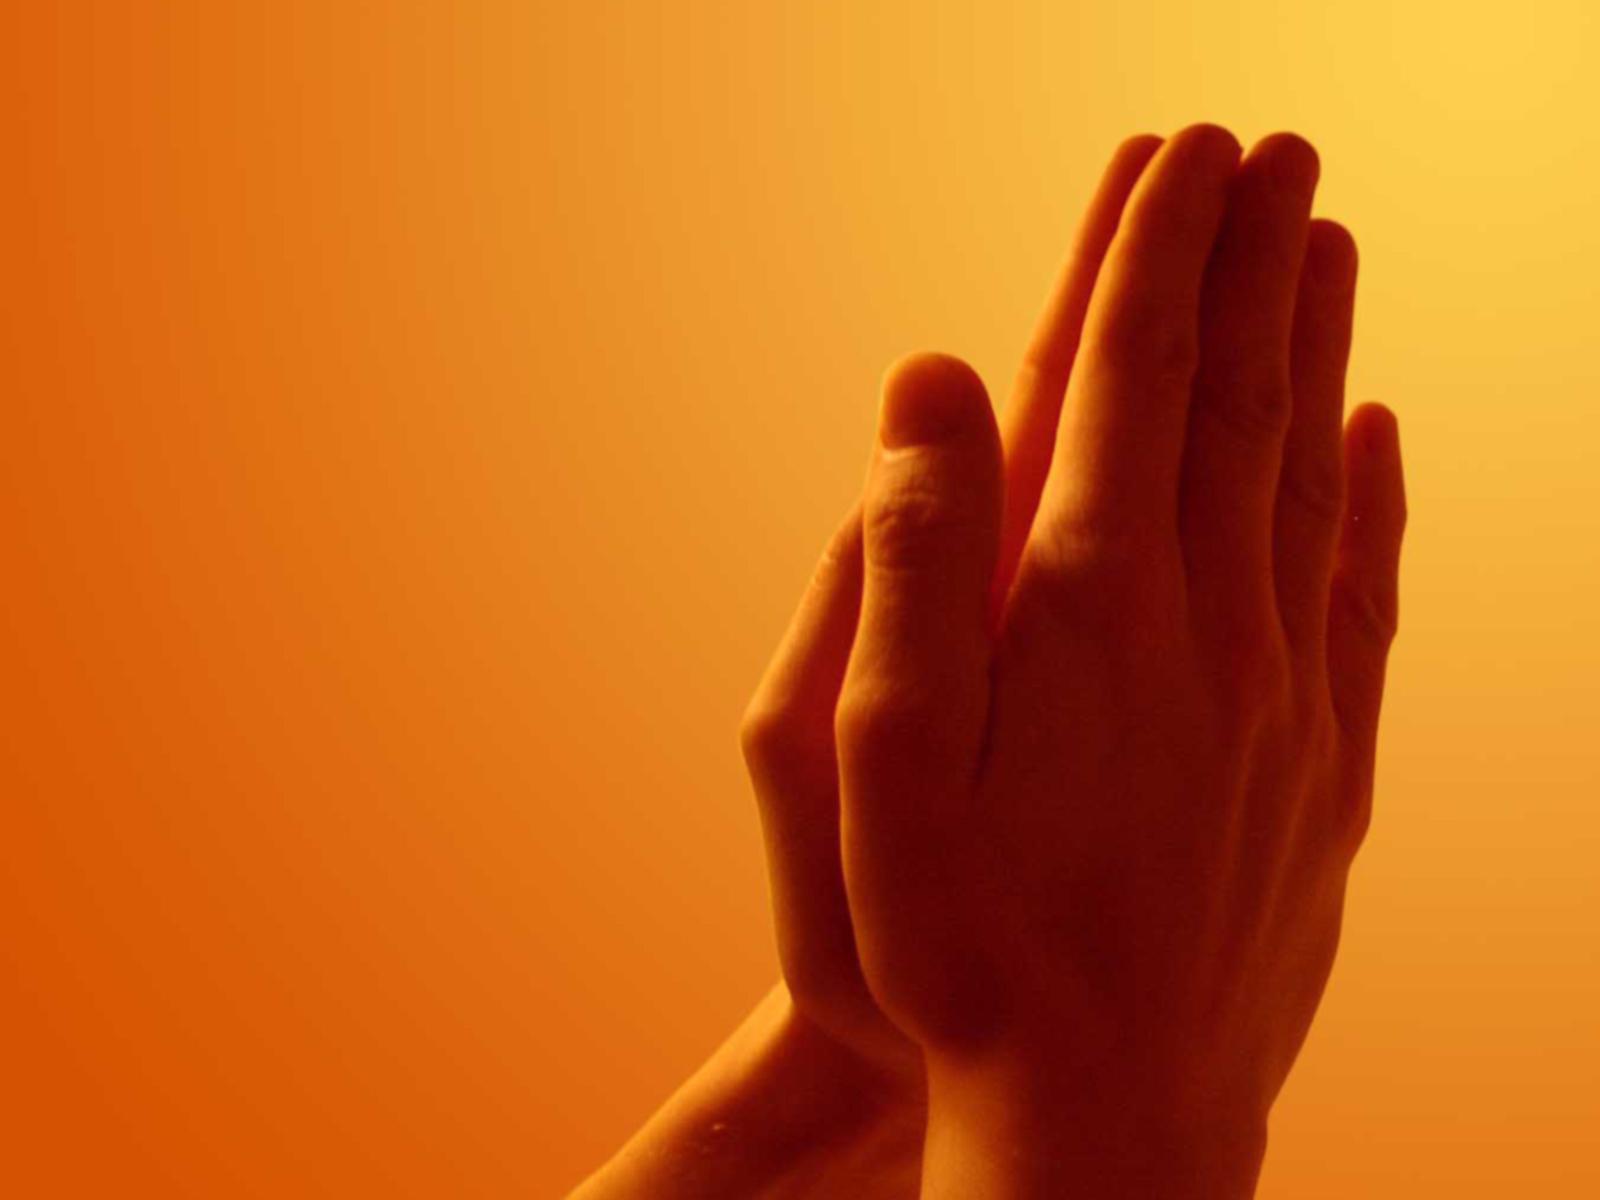 http://3.bp.blogspot.com/-xFmvDj3lLXk/TfQYjgEesKI/AAAAAAAACyQ/b-hnYMXZZ1k/s1600/Praying_Hands_freecomputerdesktopwallpaper_1600.jpg